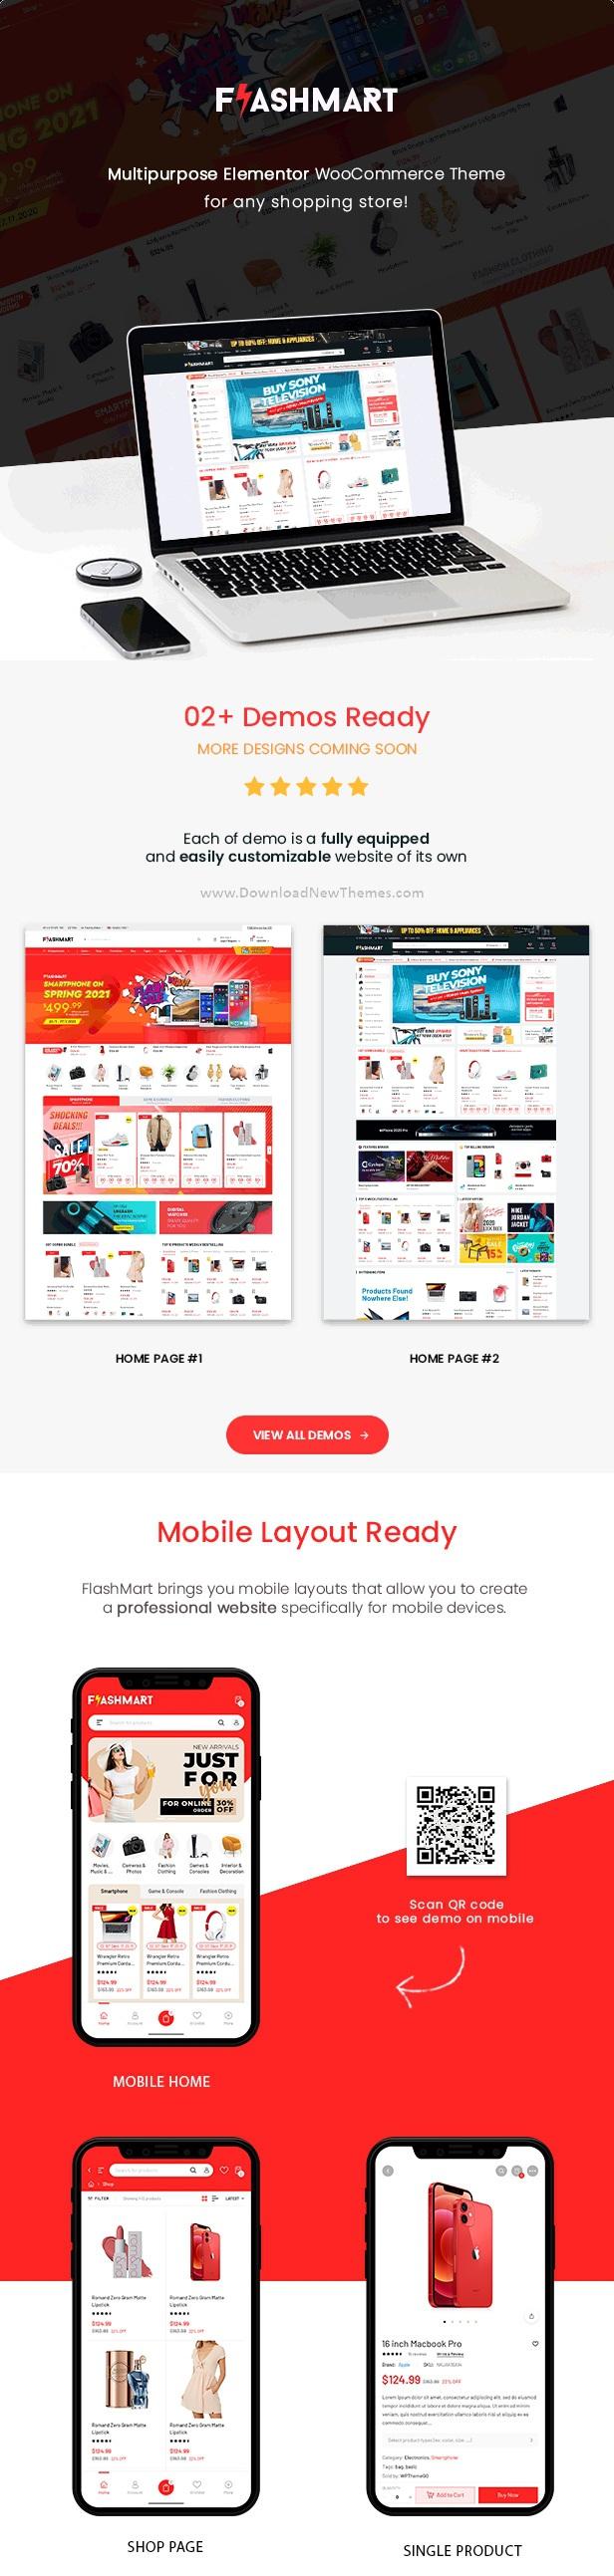 Best Multipurpose Elementor WooCommerce WordPress Theme